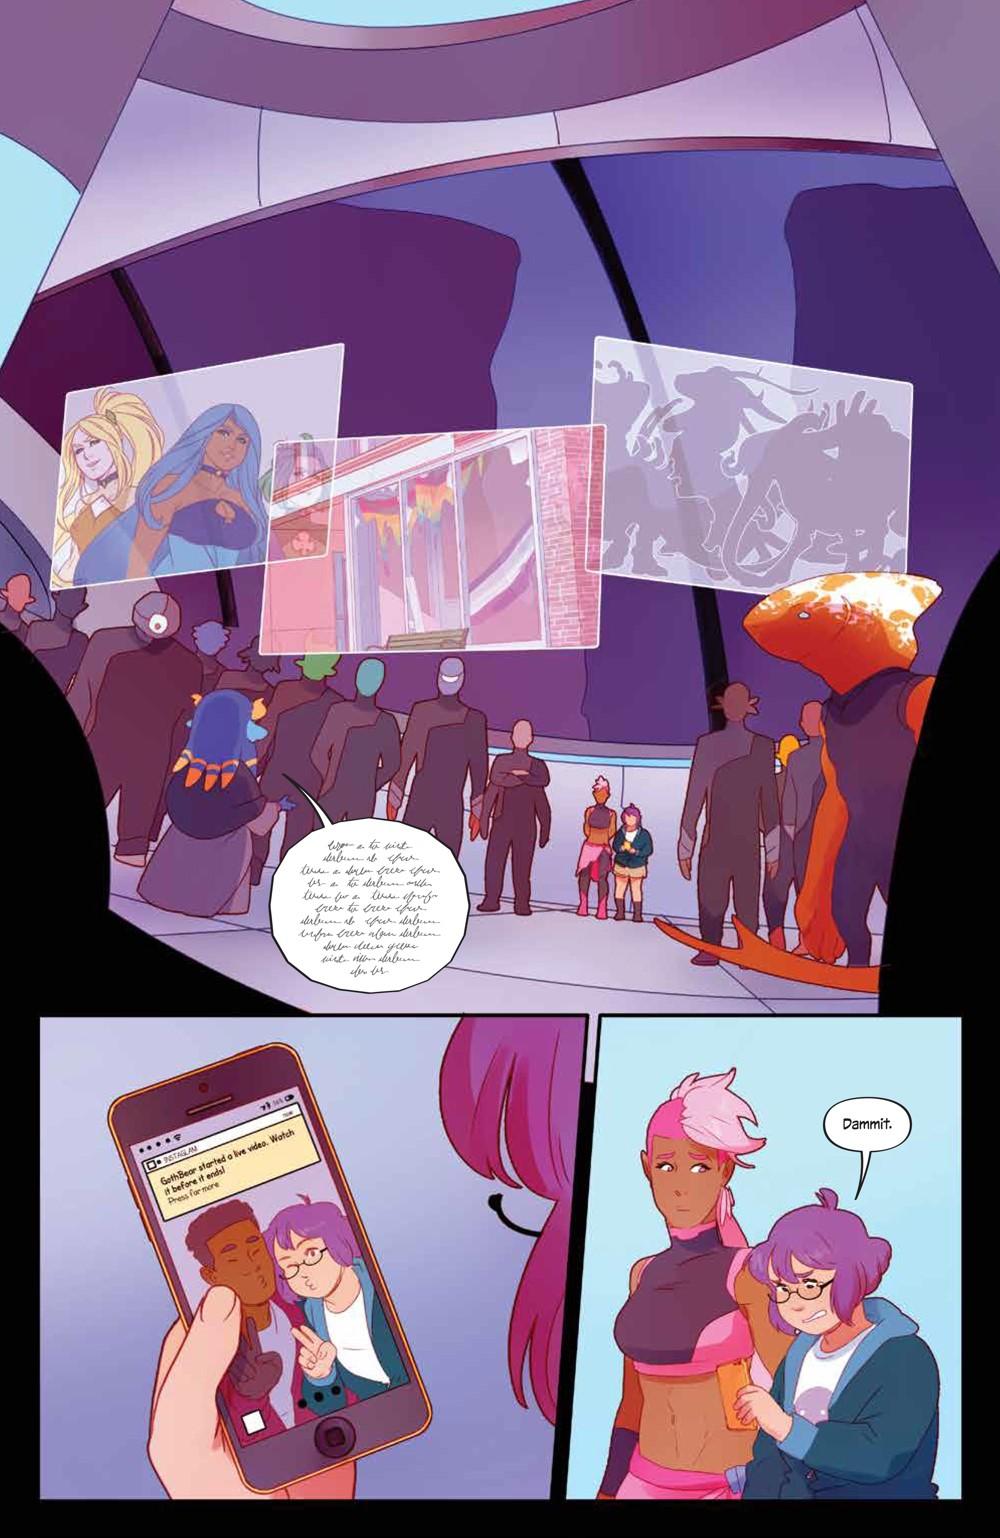 SaveYourself_003_PRESS_3 ComicList Previews: SAVE YOURSELF #3 (OF 4)